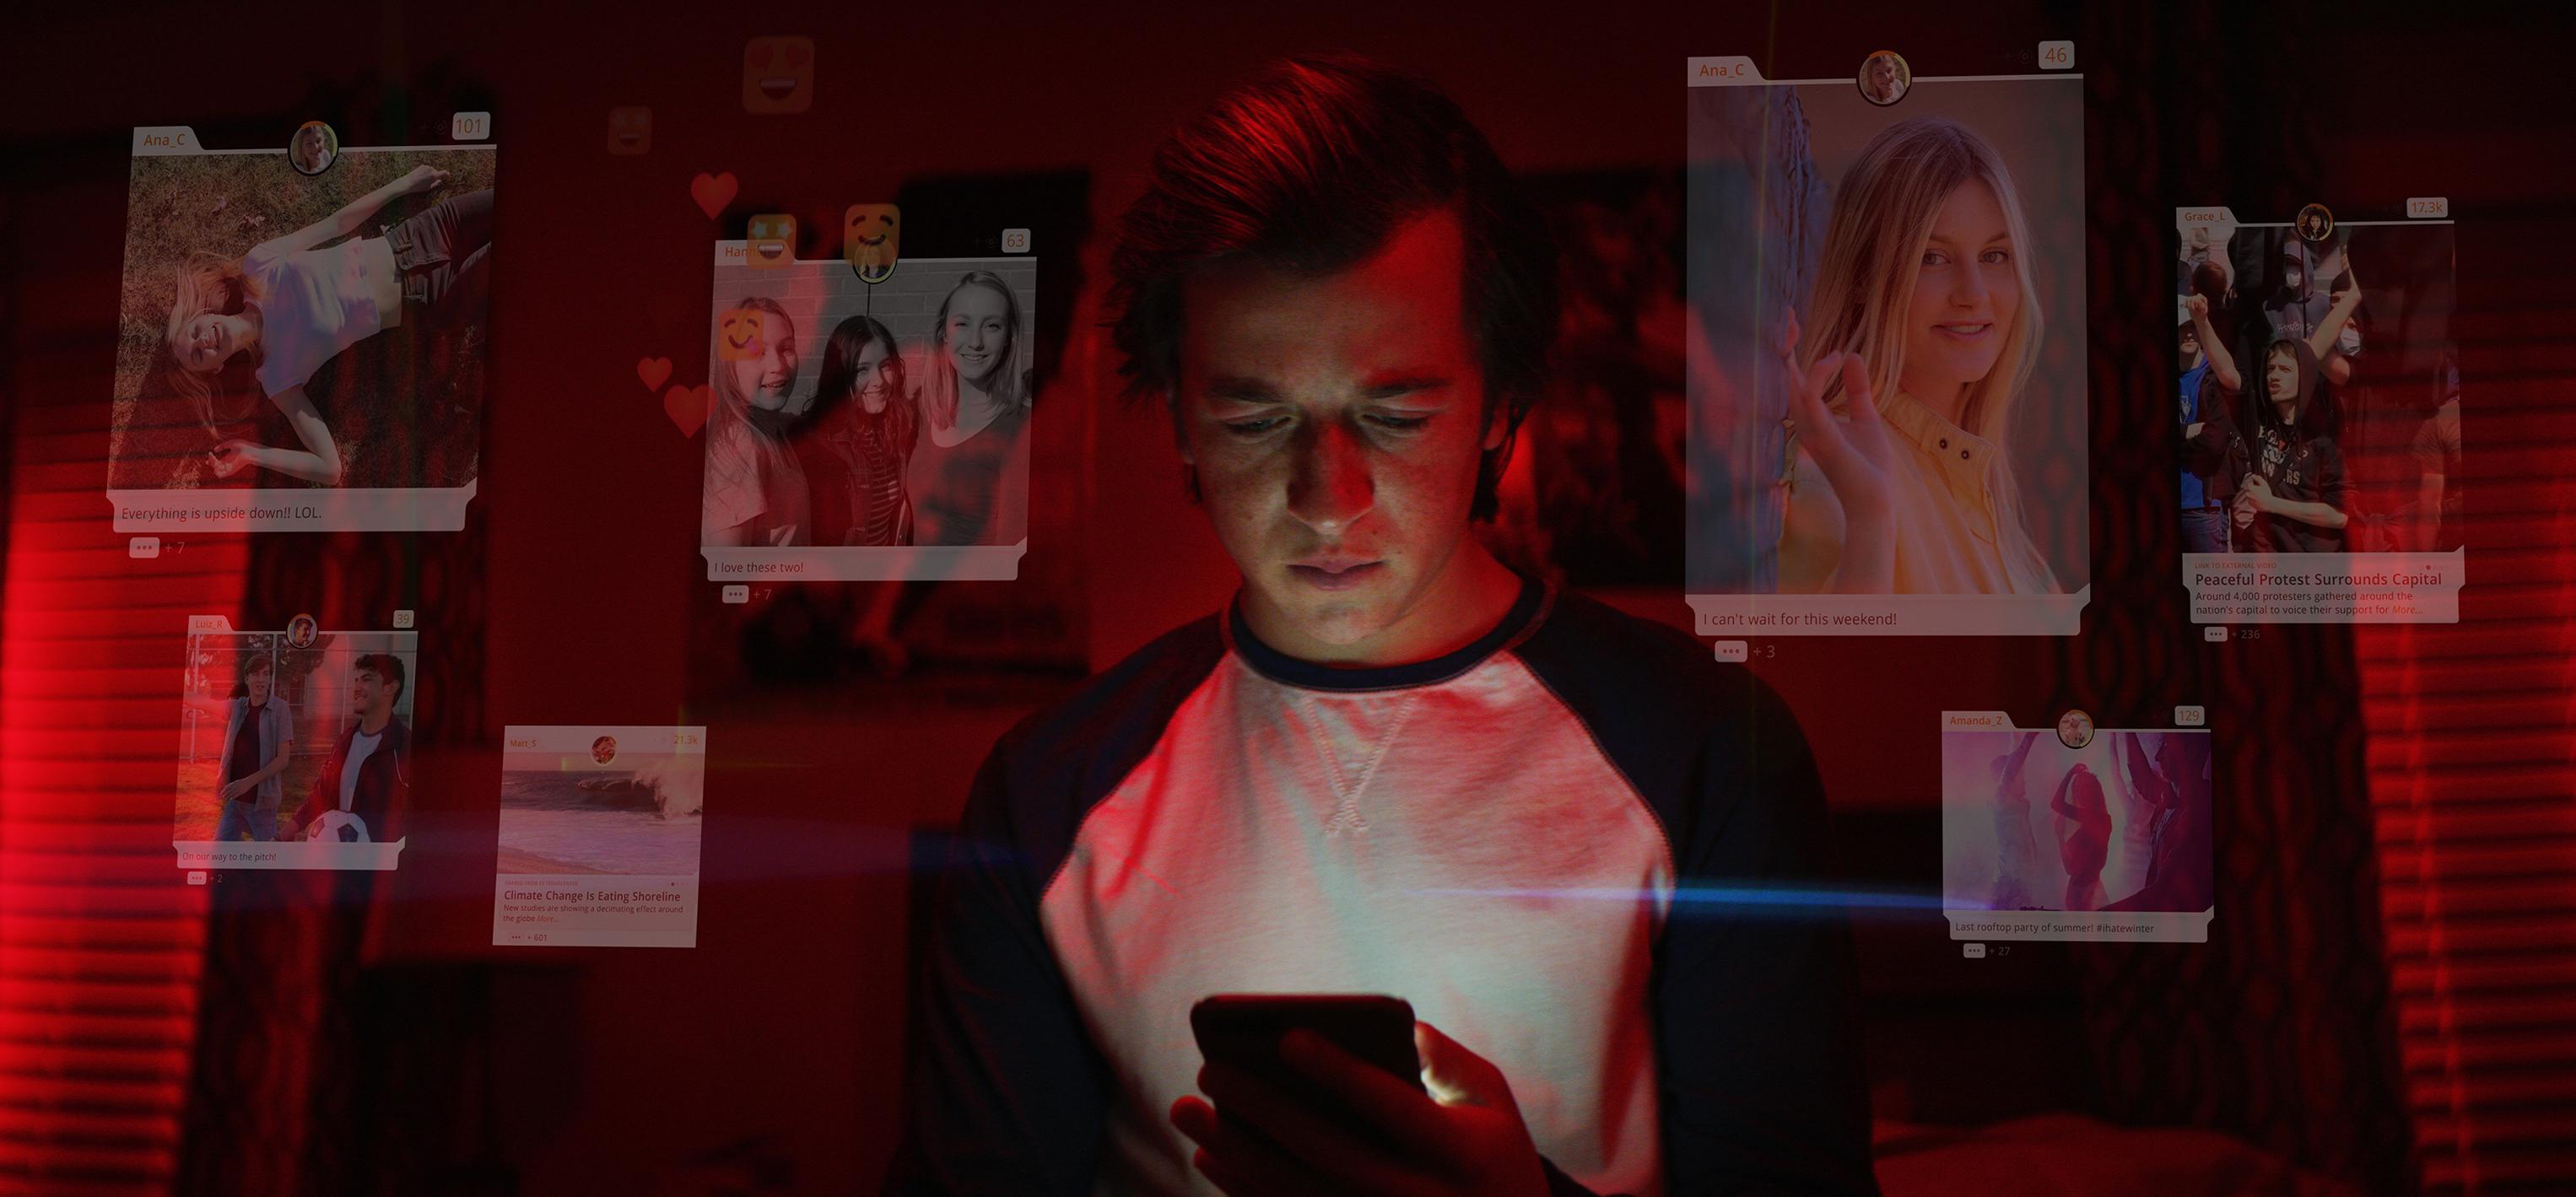 THE SOCIAL DILEMMA | NETFLIX (2020) ทุนนิยมสอดแนม – ภัยแฝงเครือข่ายอัจฉริยะ